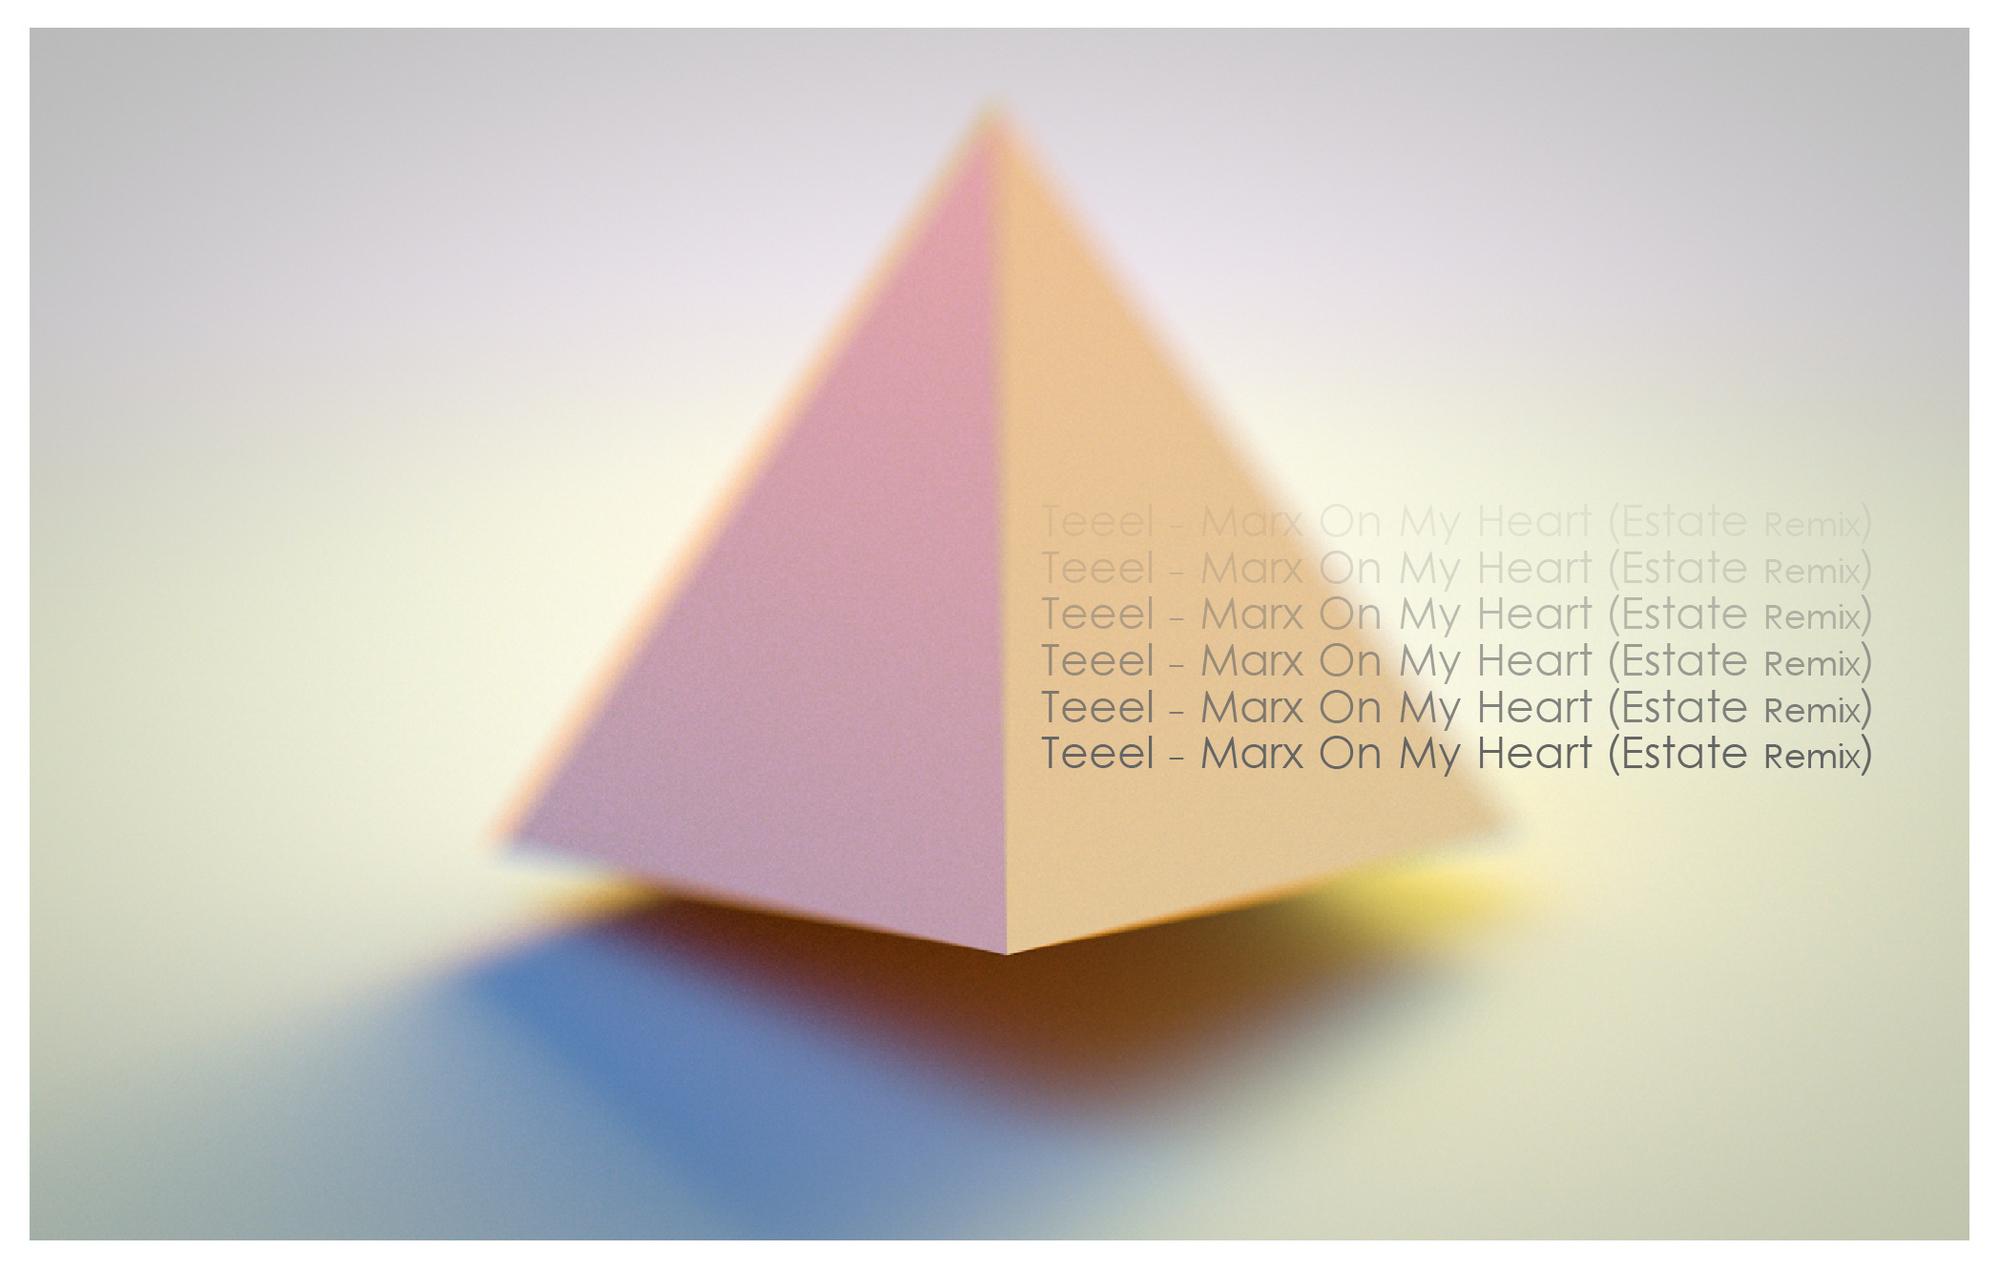 teeel - marx on my heart estate remix-02.jpg